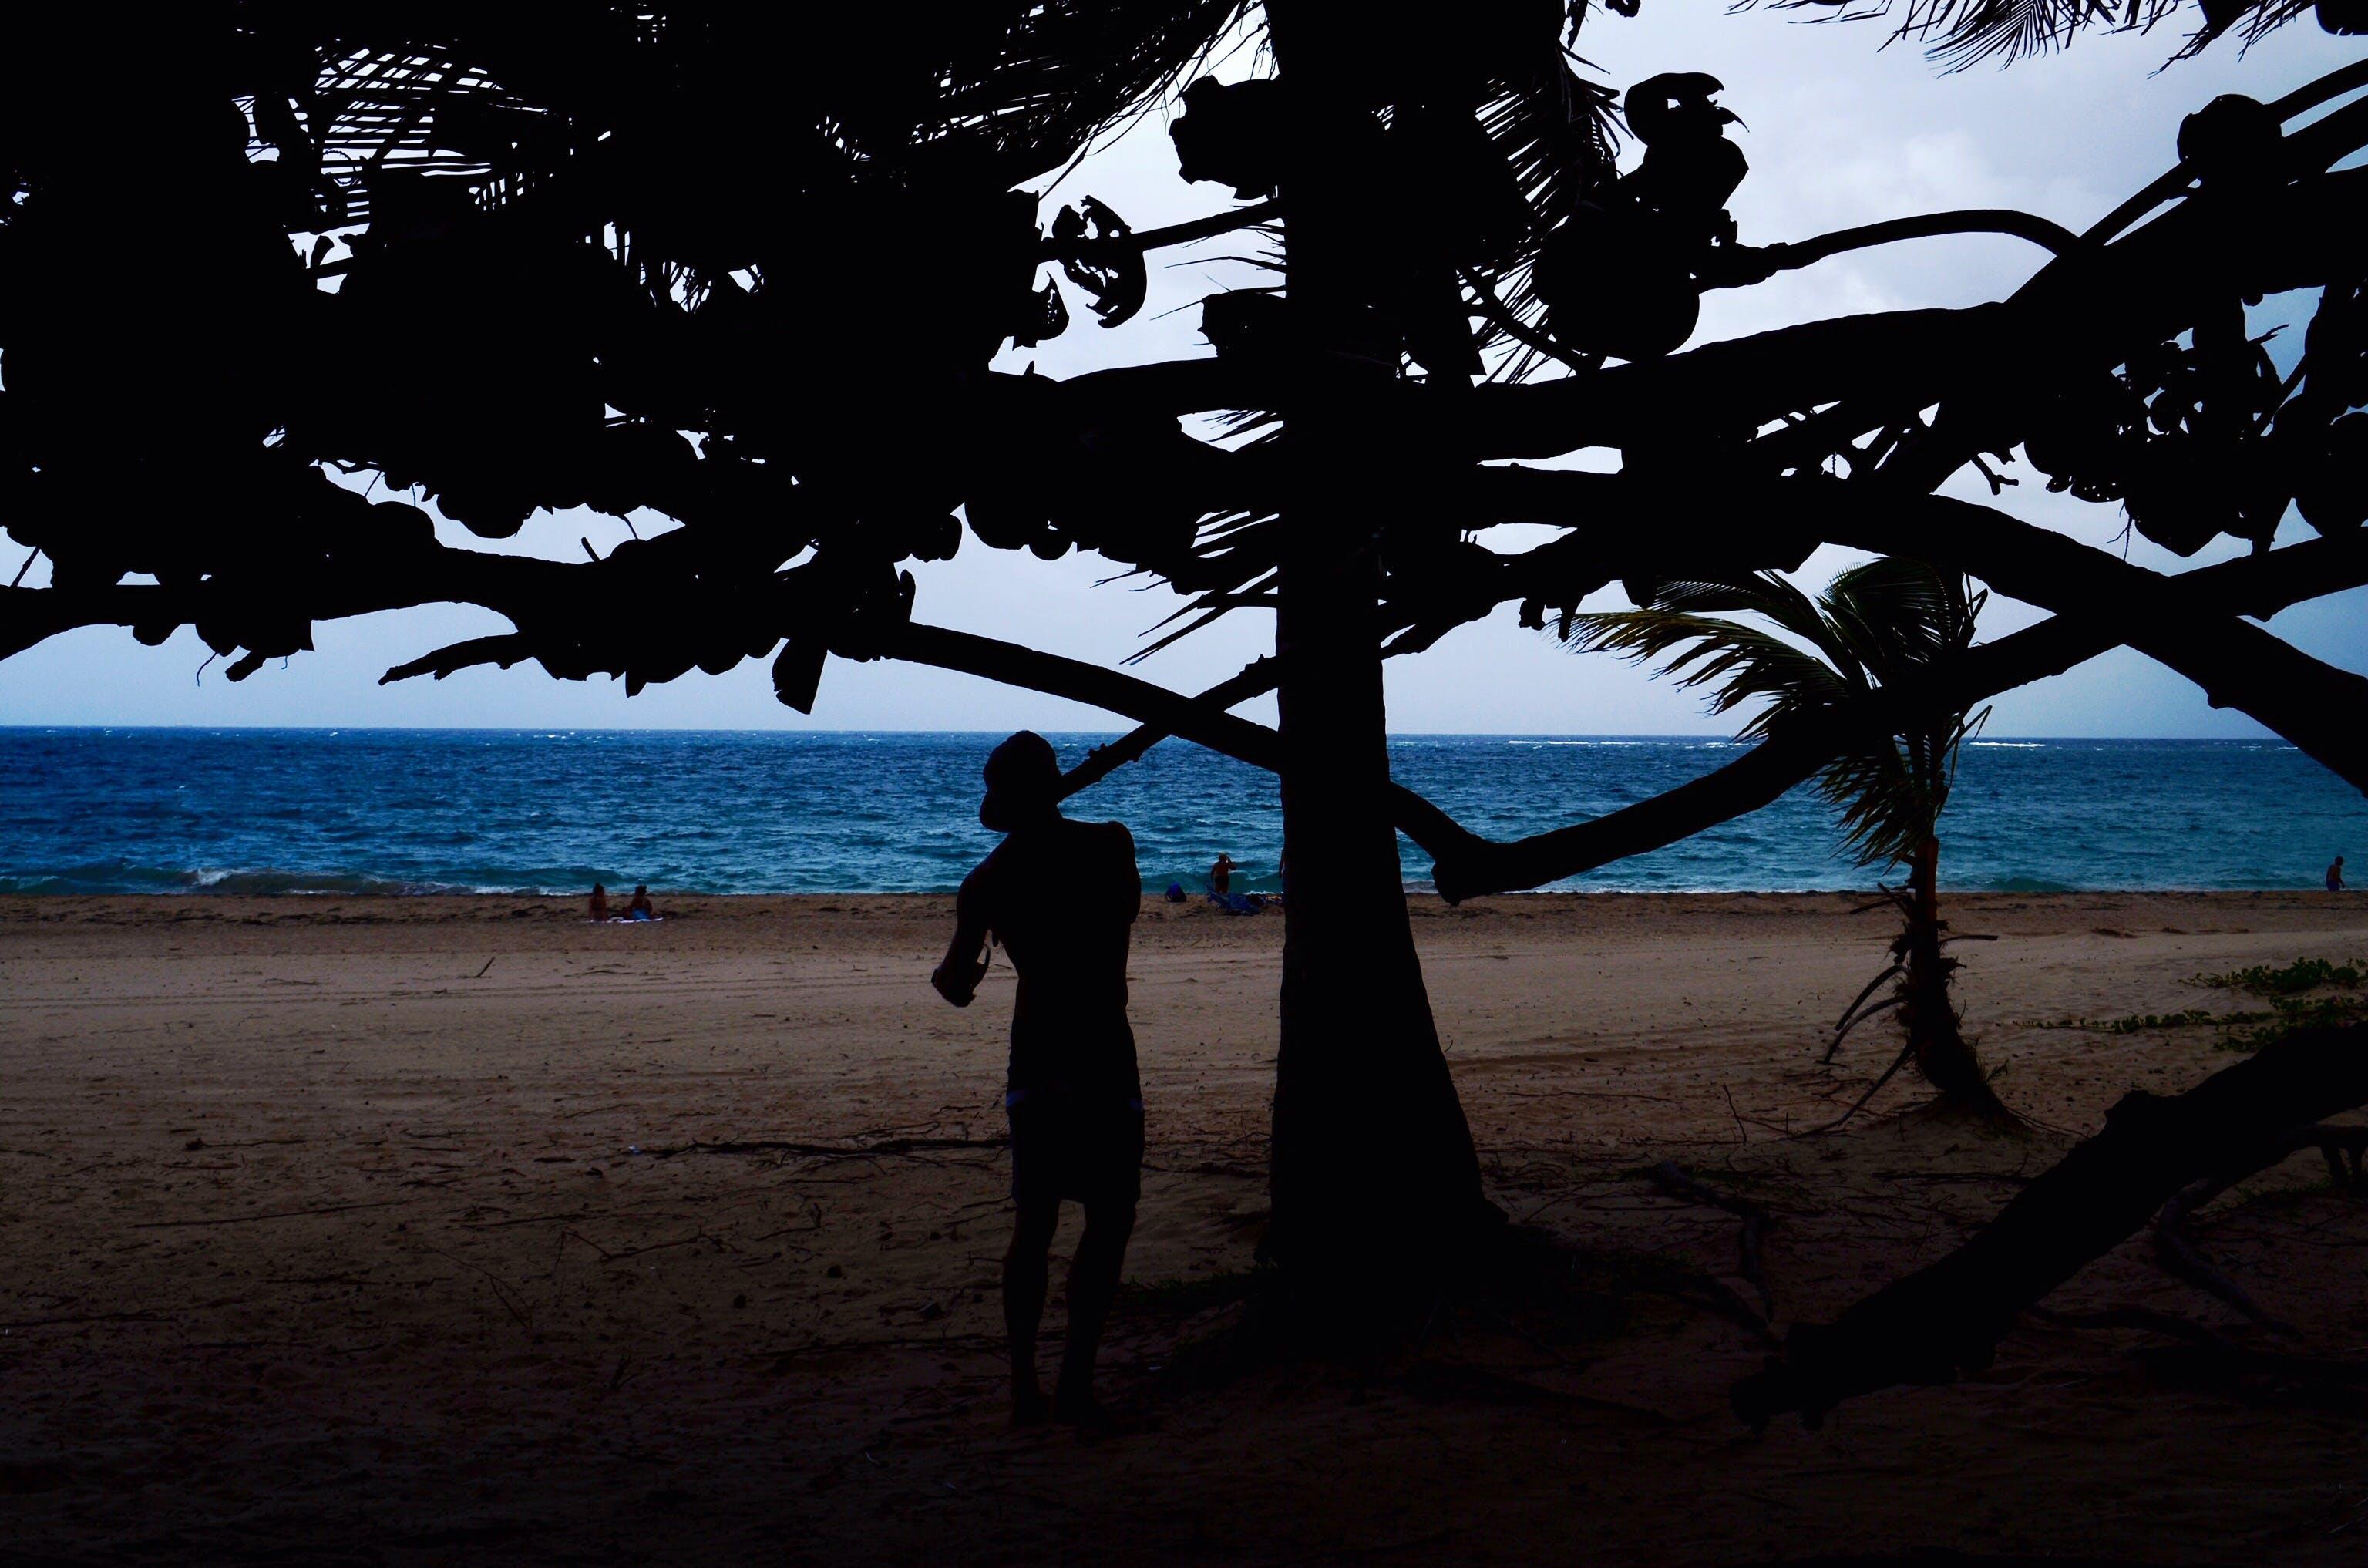 Fotos de stock gratuitas de agua, árbol, arena, caribeño